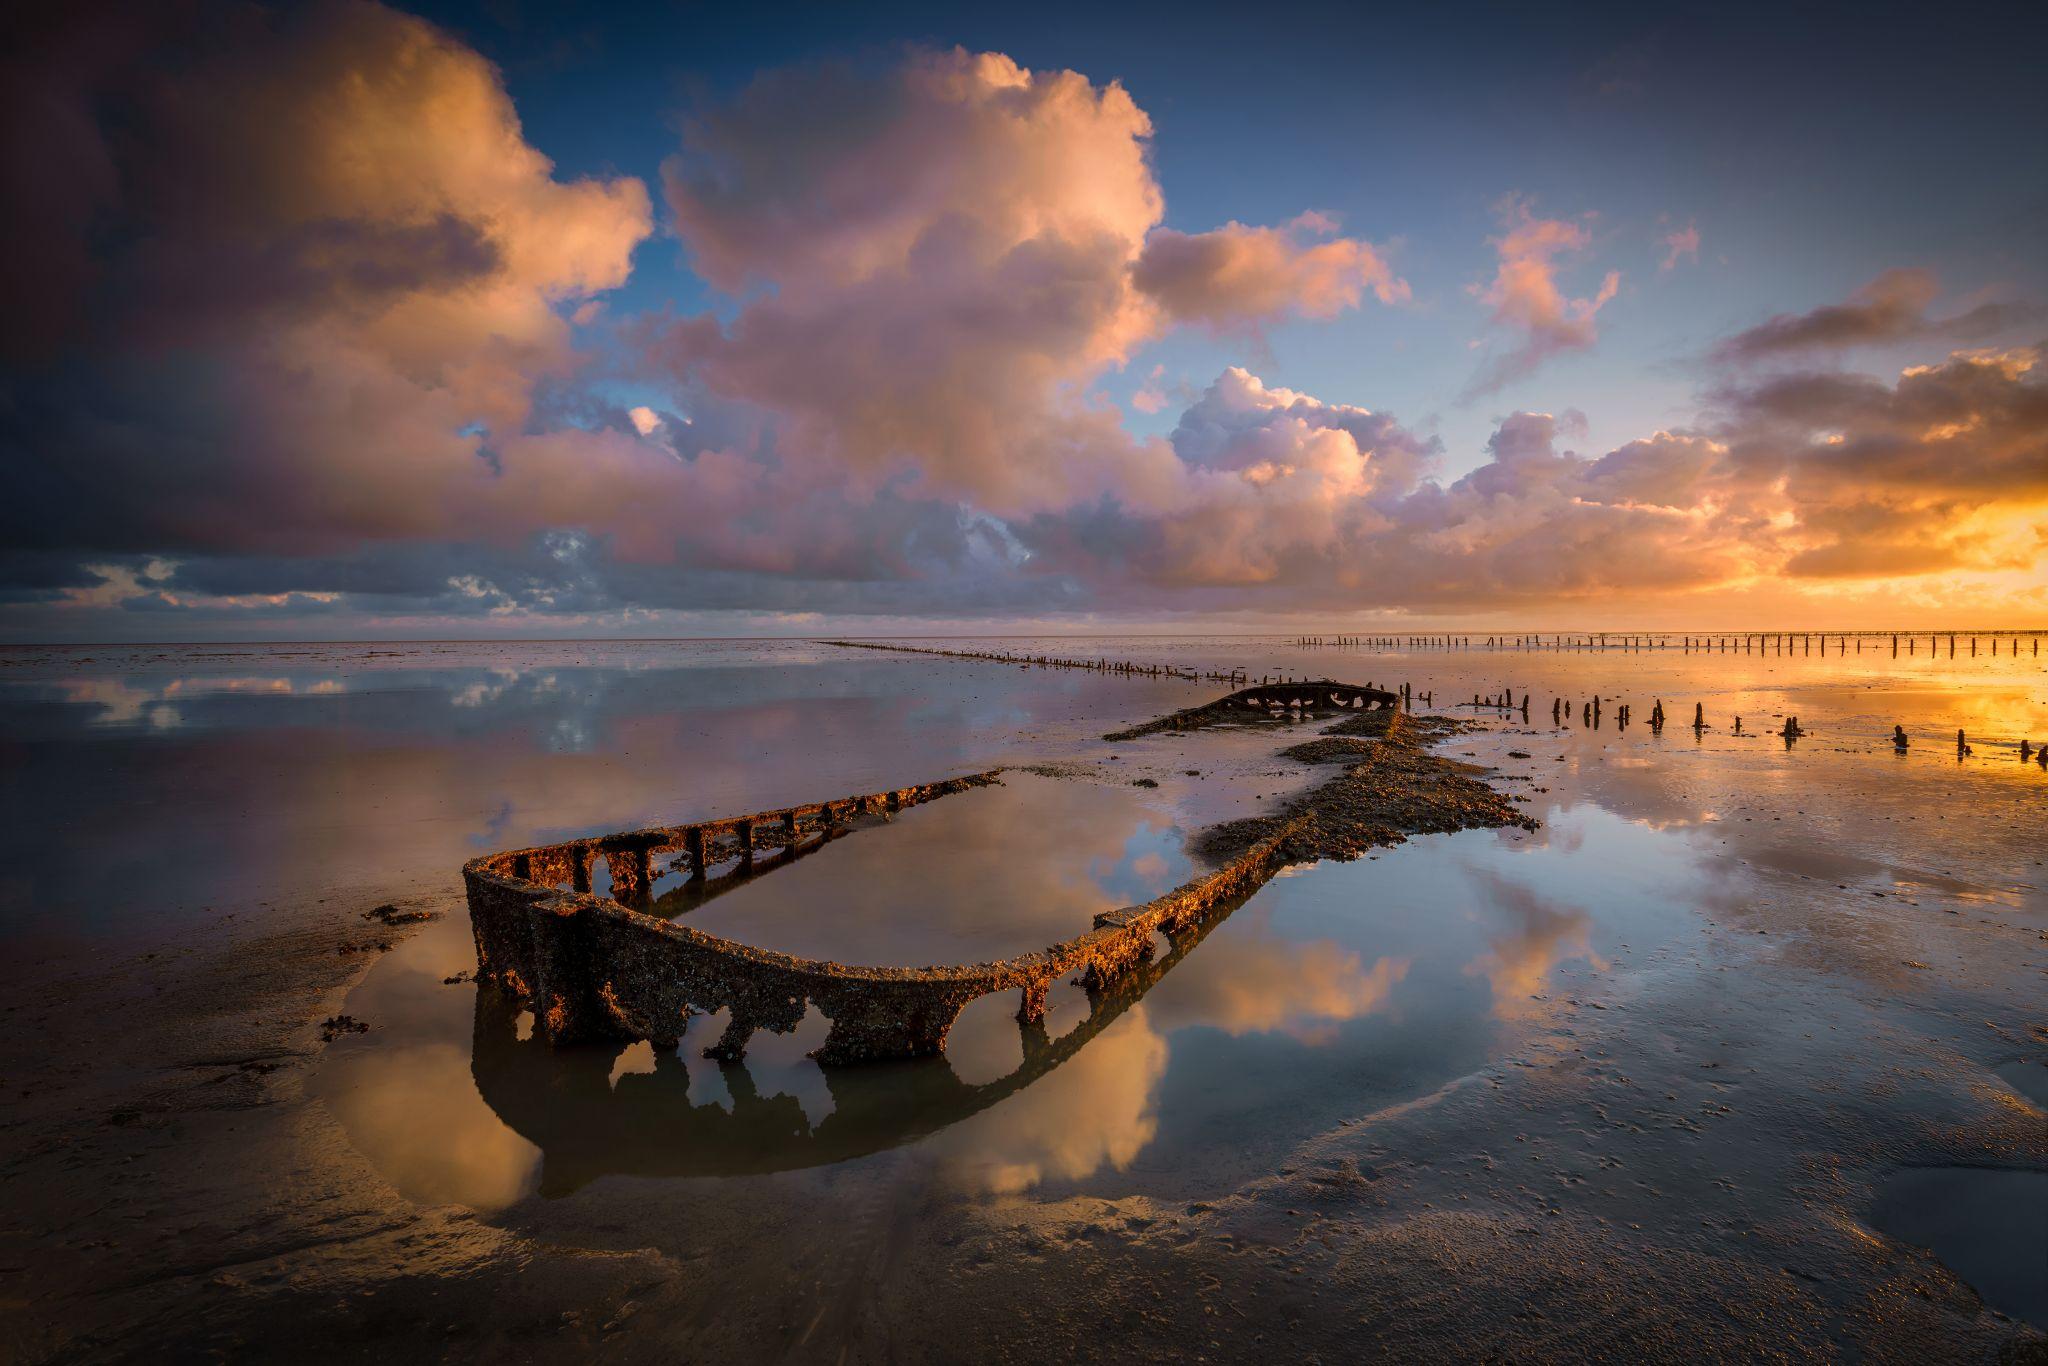 Shipwreck Wierum, Netherlands